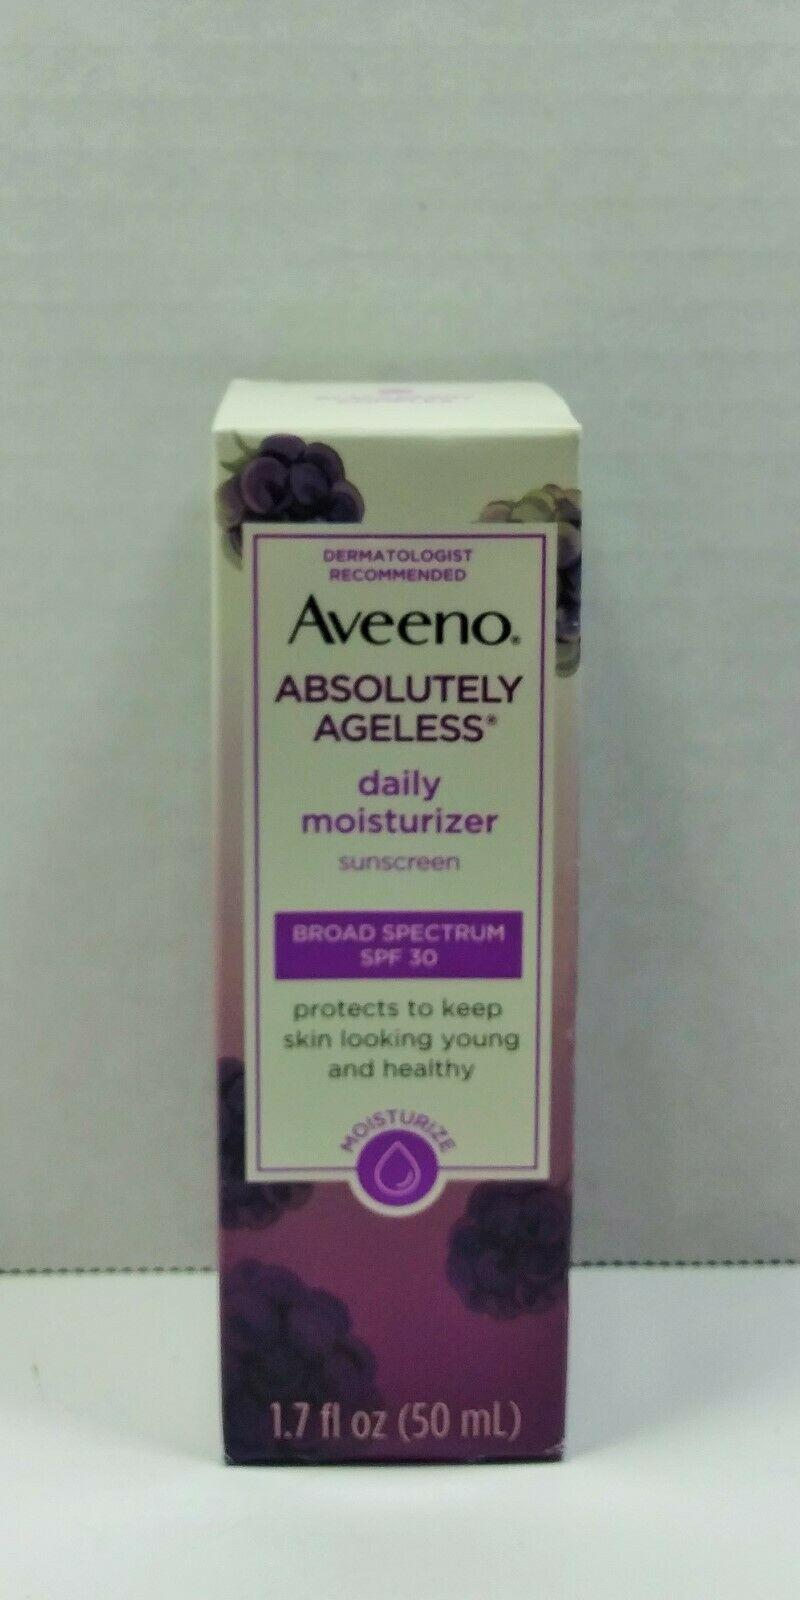 Aveeno Absolutely Ageless Daily Moisturizer - Broad Spectrum SPF 30 image 2